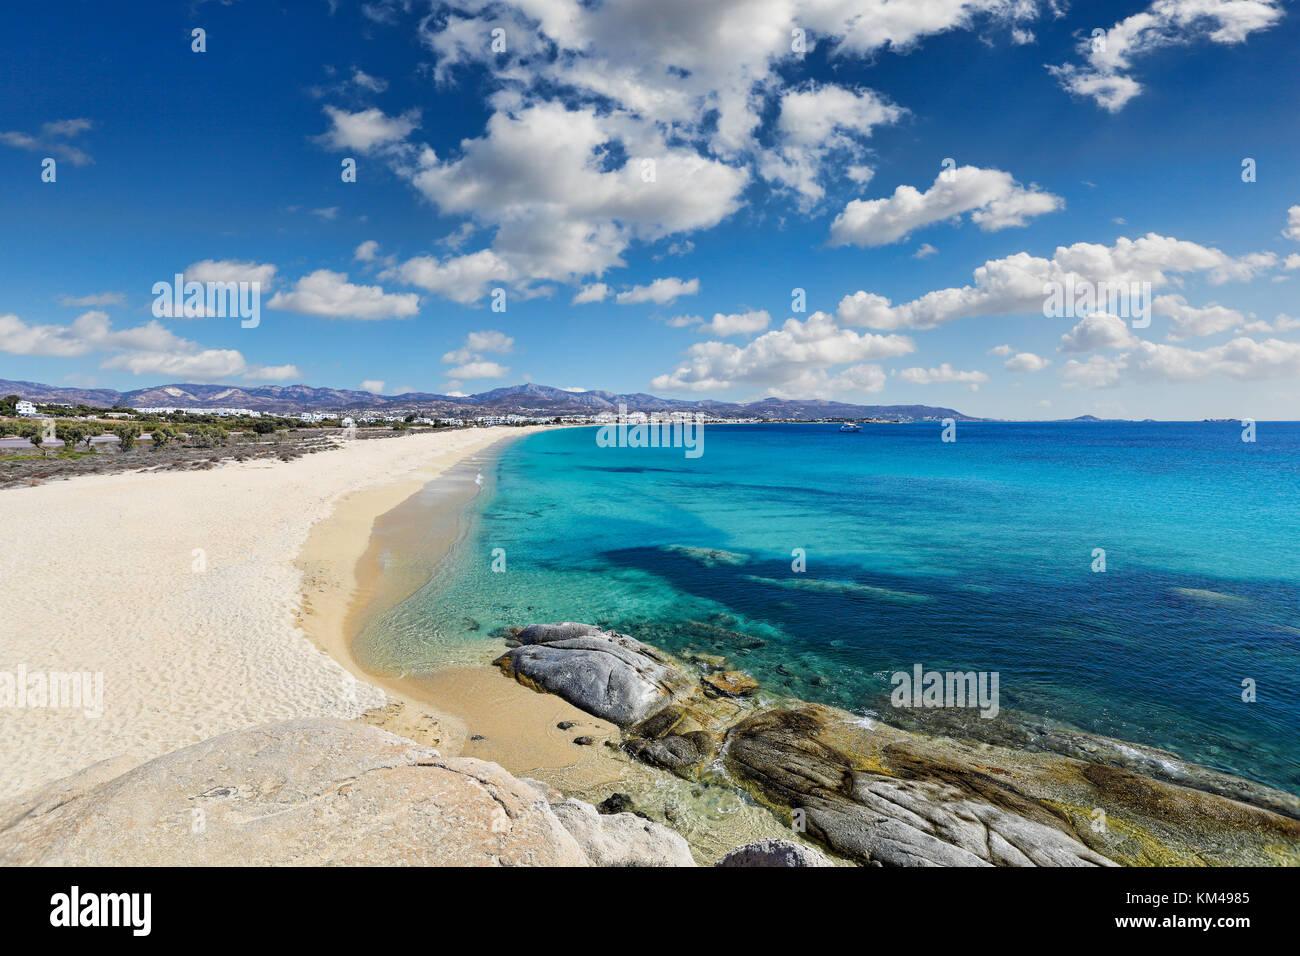 Agios Prokopios beach in Naxos island, Greece Stock Photo